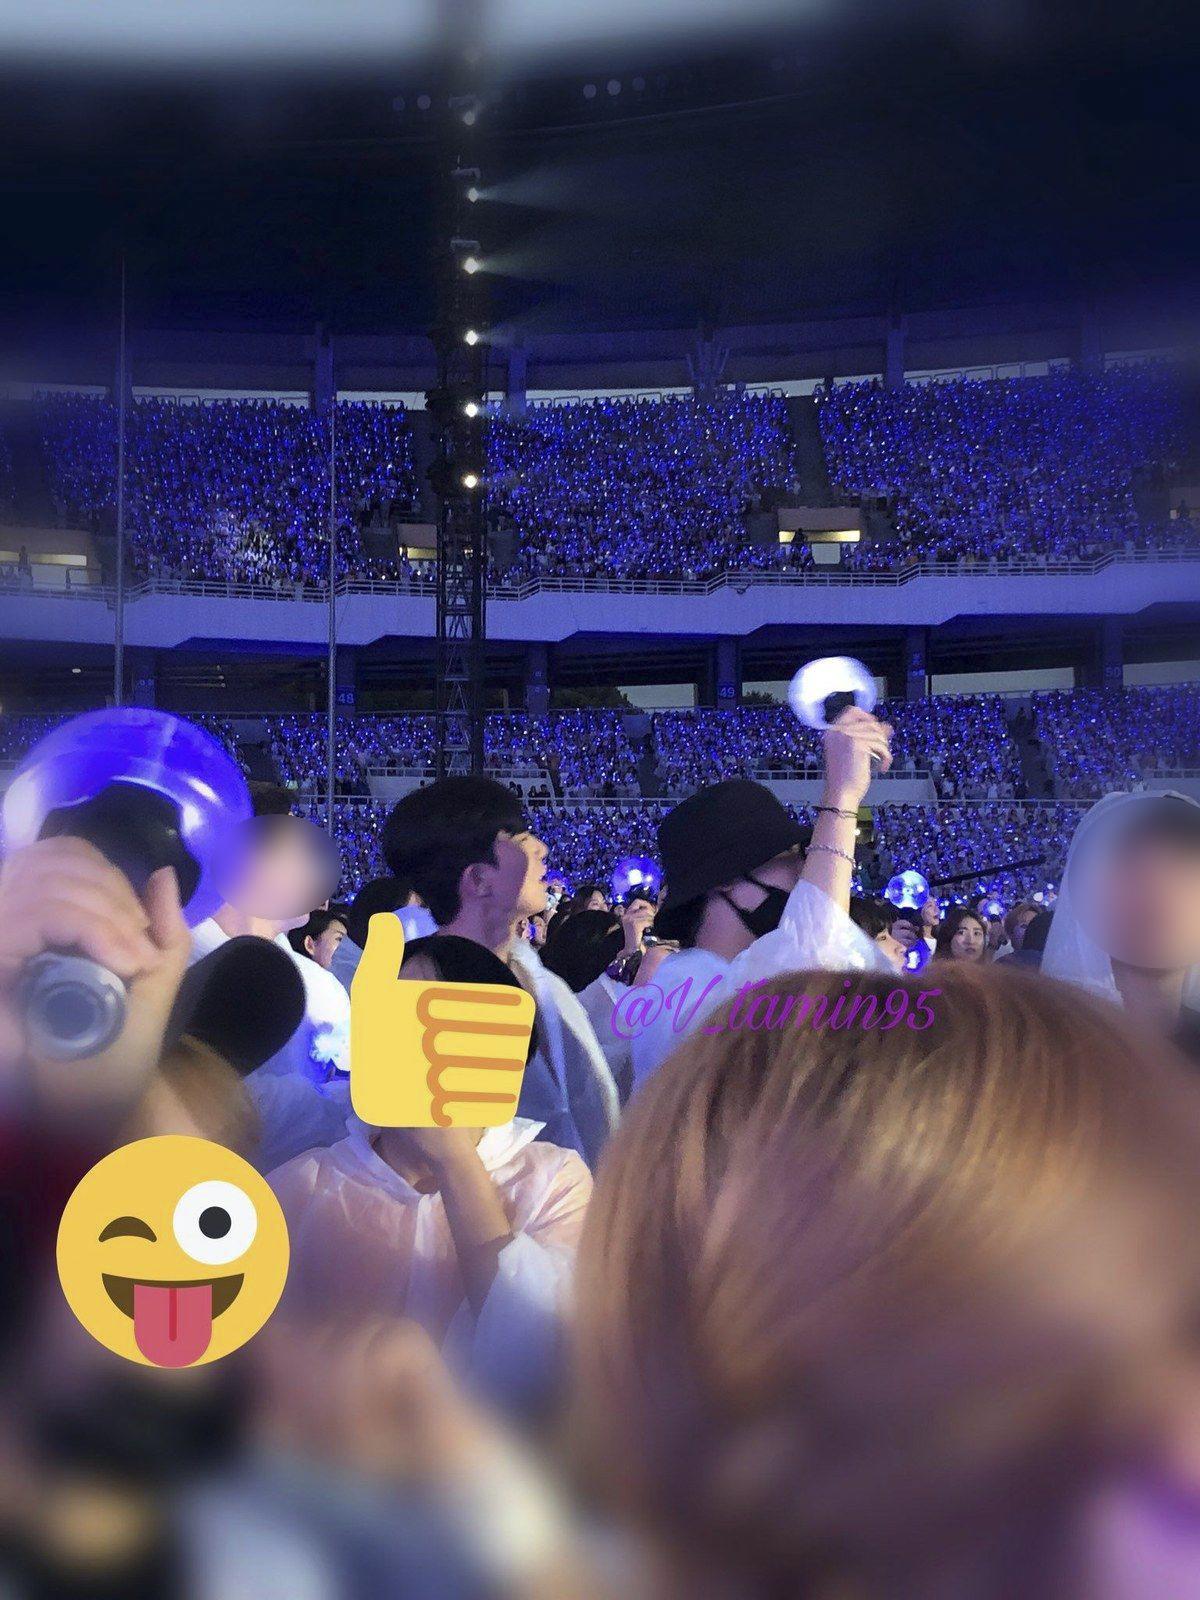 bts concert park seo jun hyung sik 5